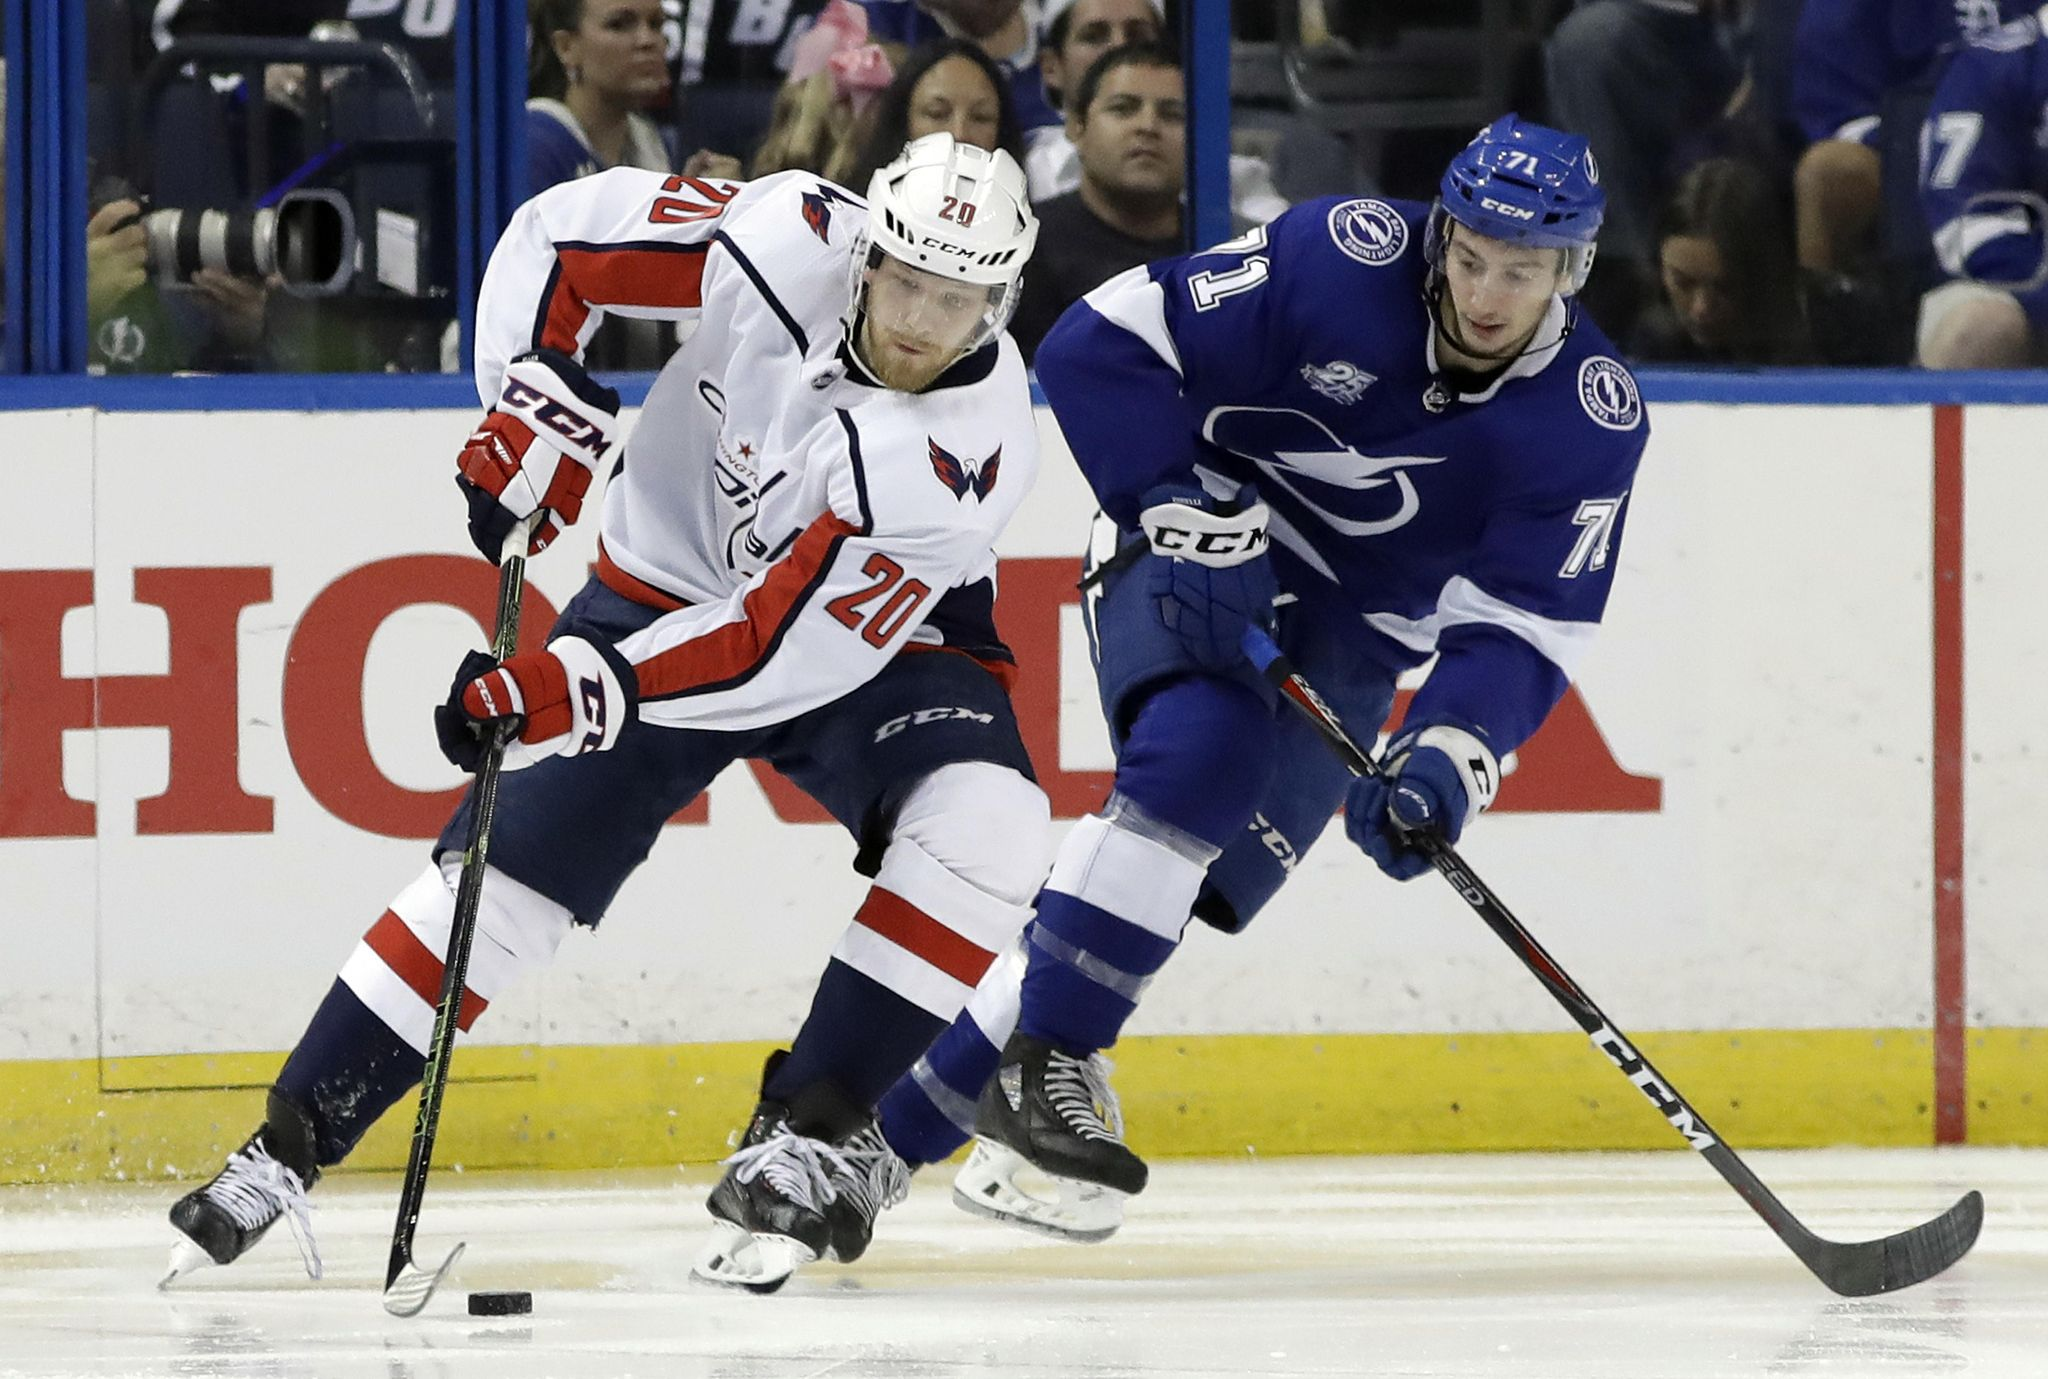 Capitals_lightning_hockey_82413_s2048x1379